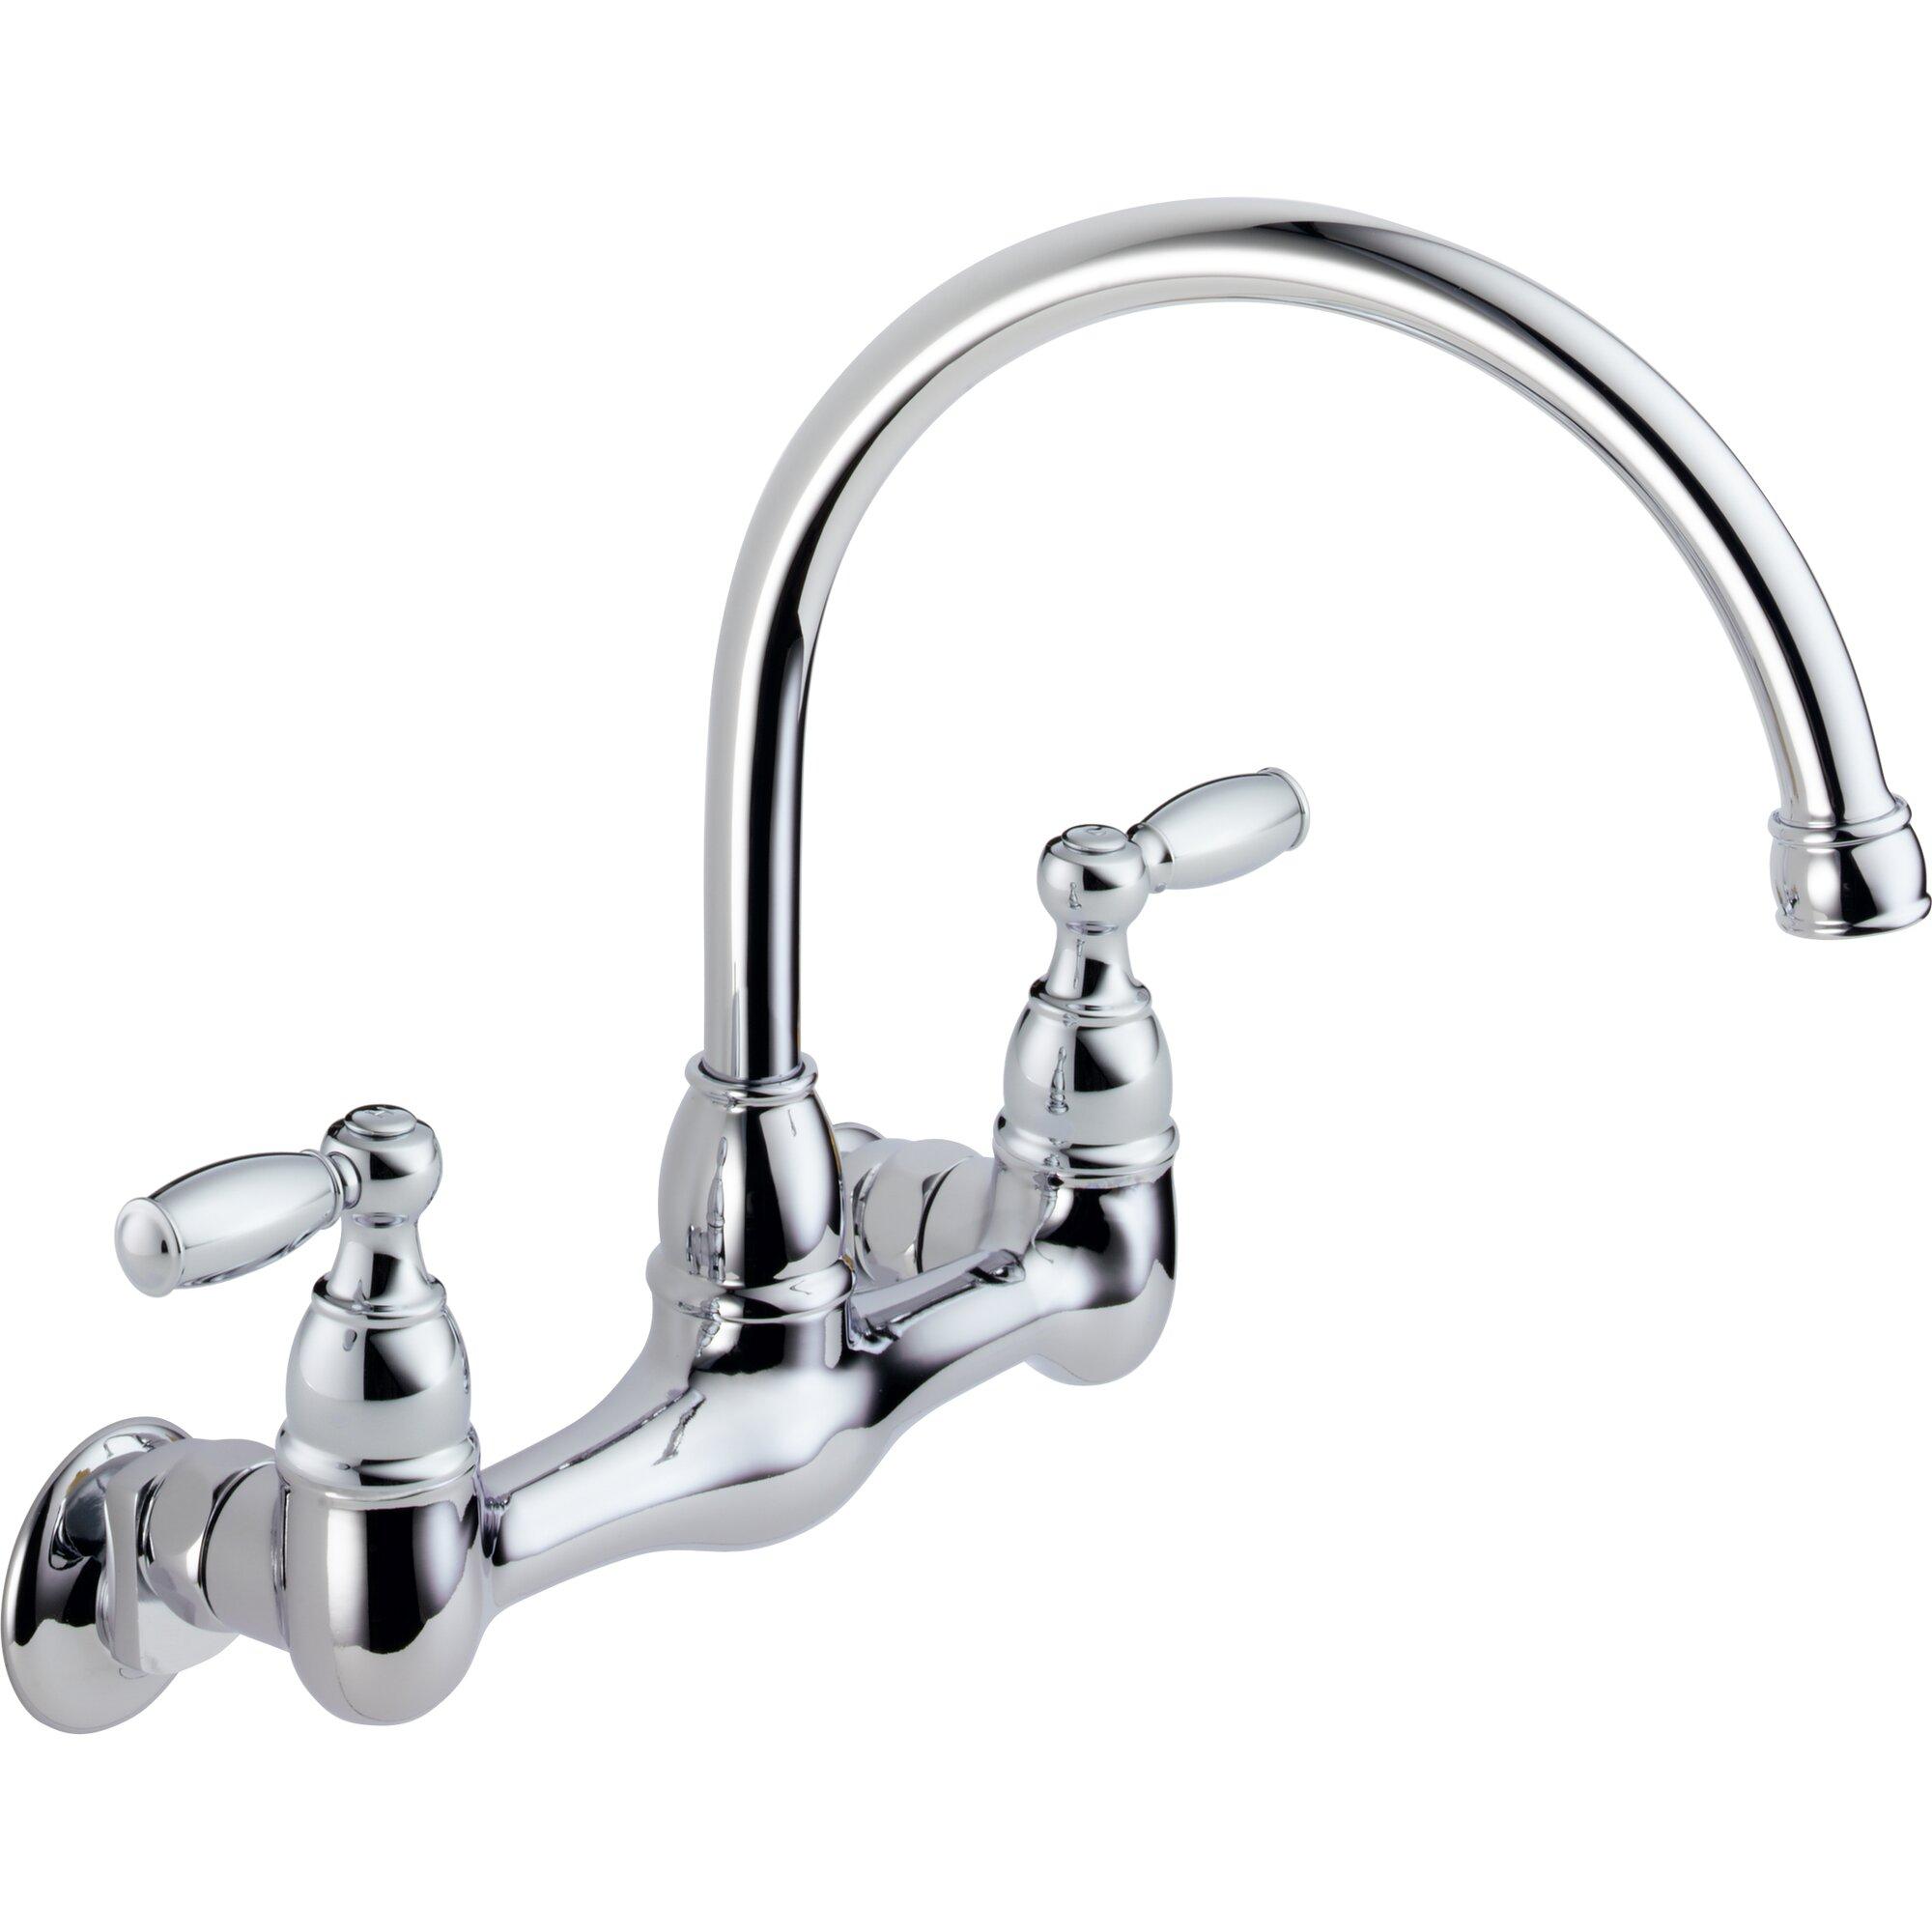 Wall Mount Kitchen Faucet wholesale wall mount kitchen faucet cold water only Two Handle Wall Mounted Kitchen Faucet